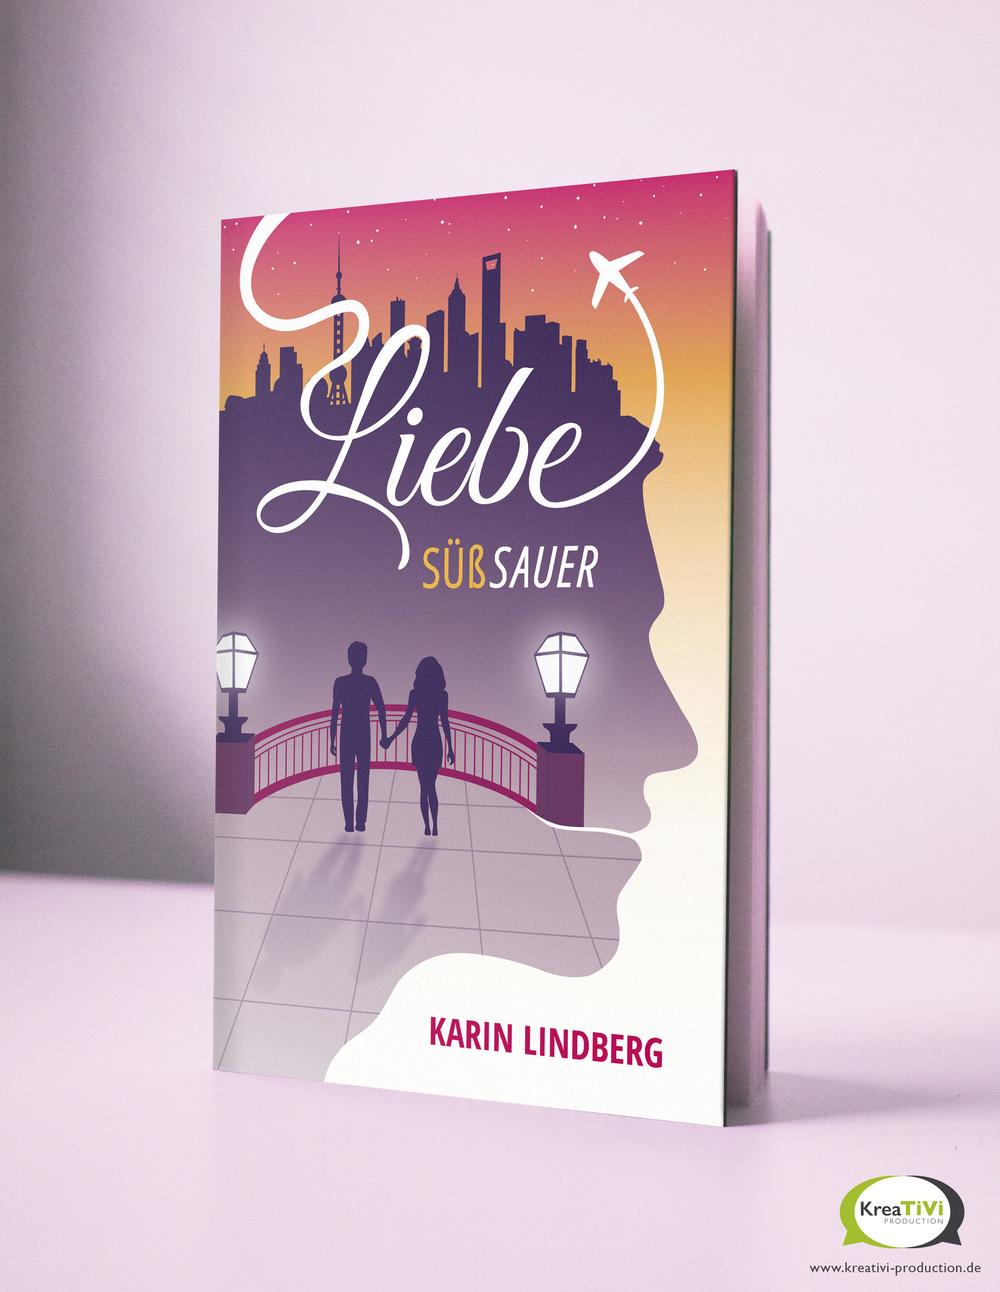 Liebe_süßsauer_karin_lindberg